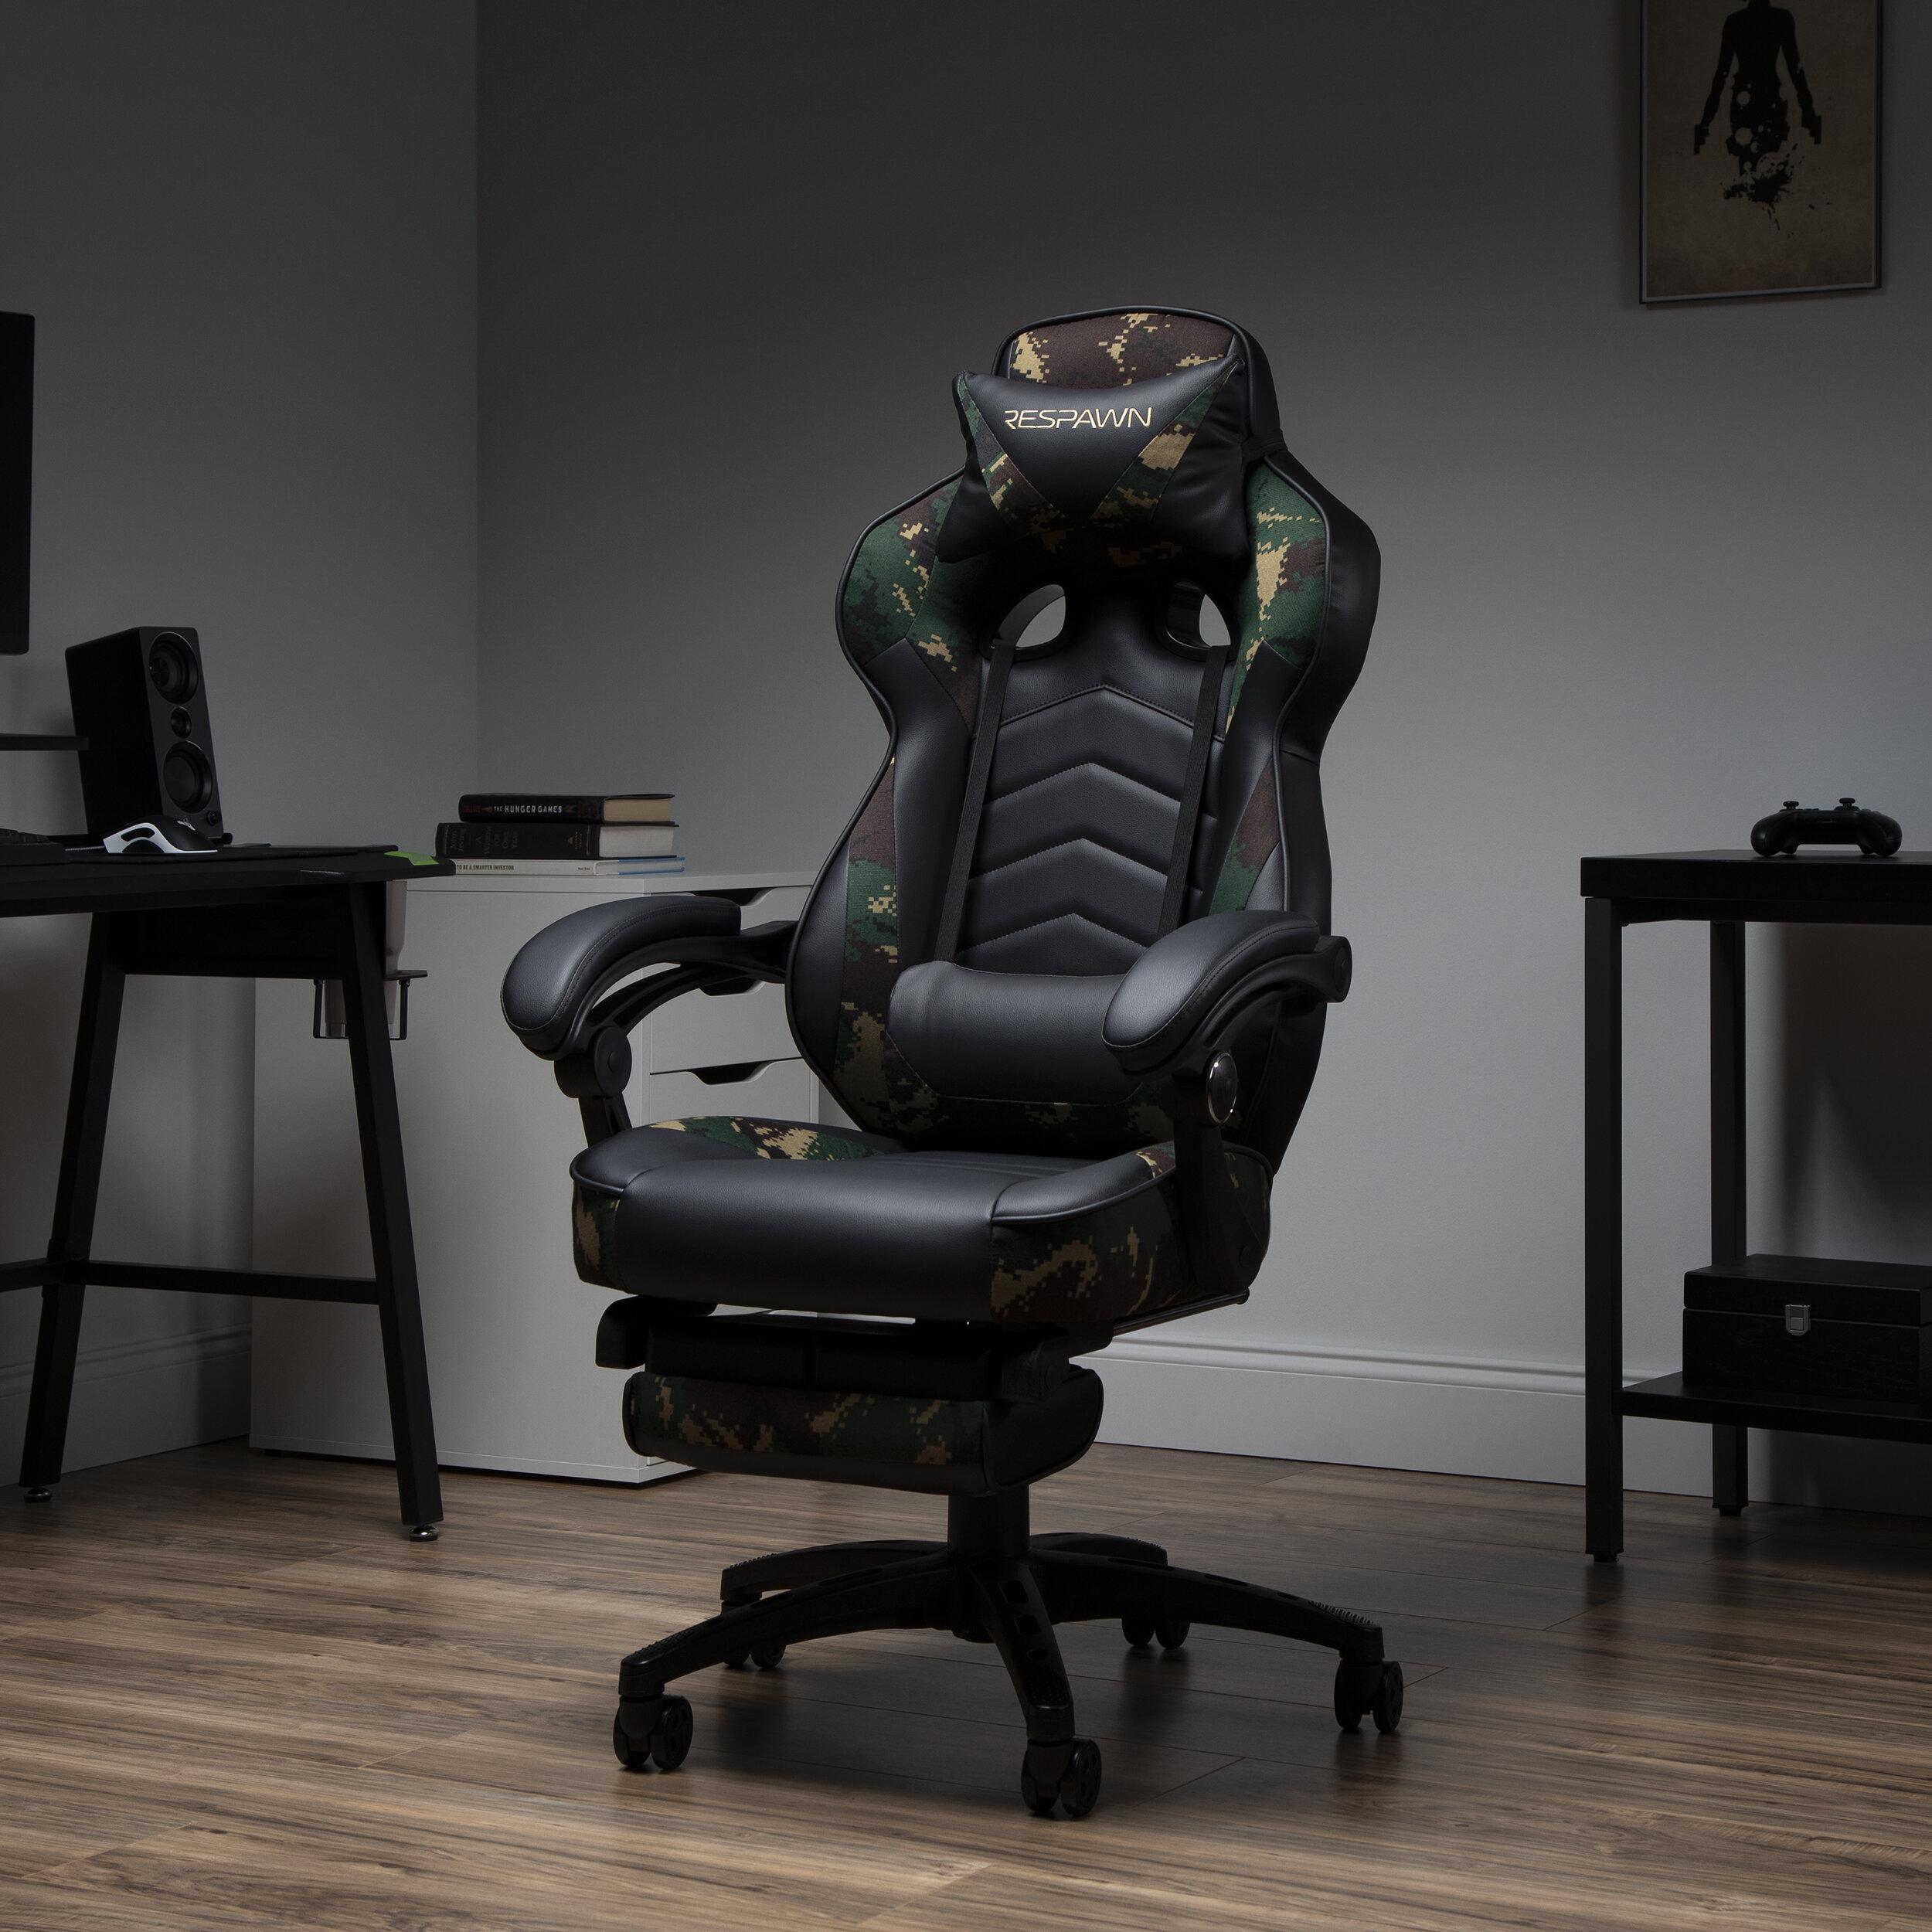 Respawn Pc Racing Game Chair Reviews Wayfair Ca